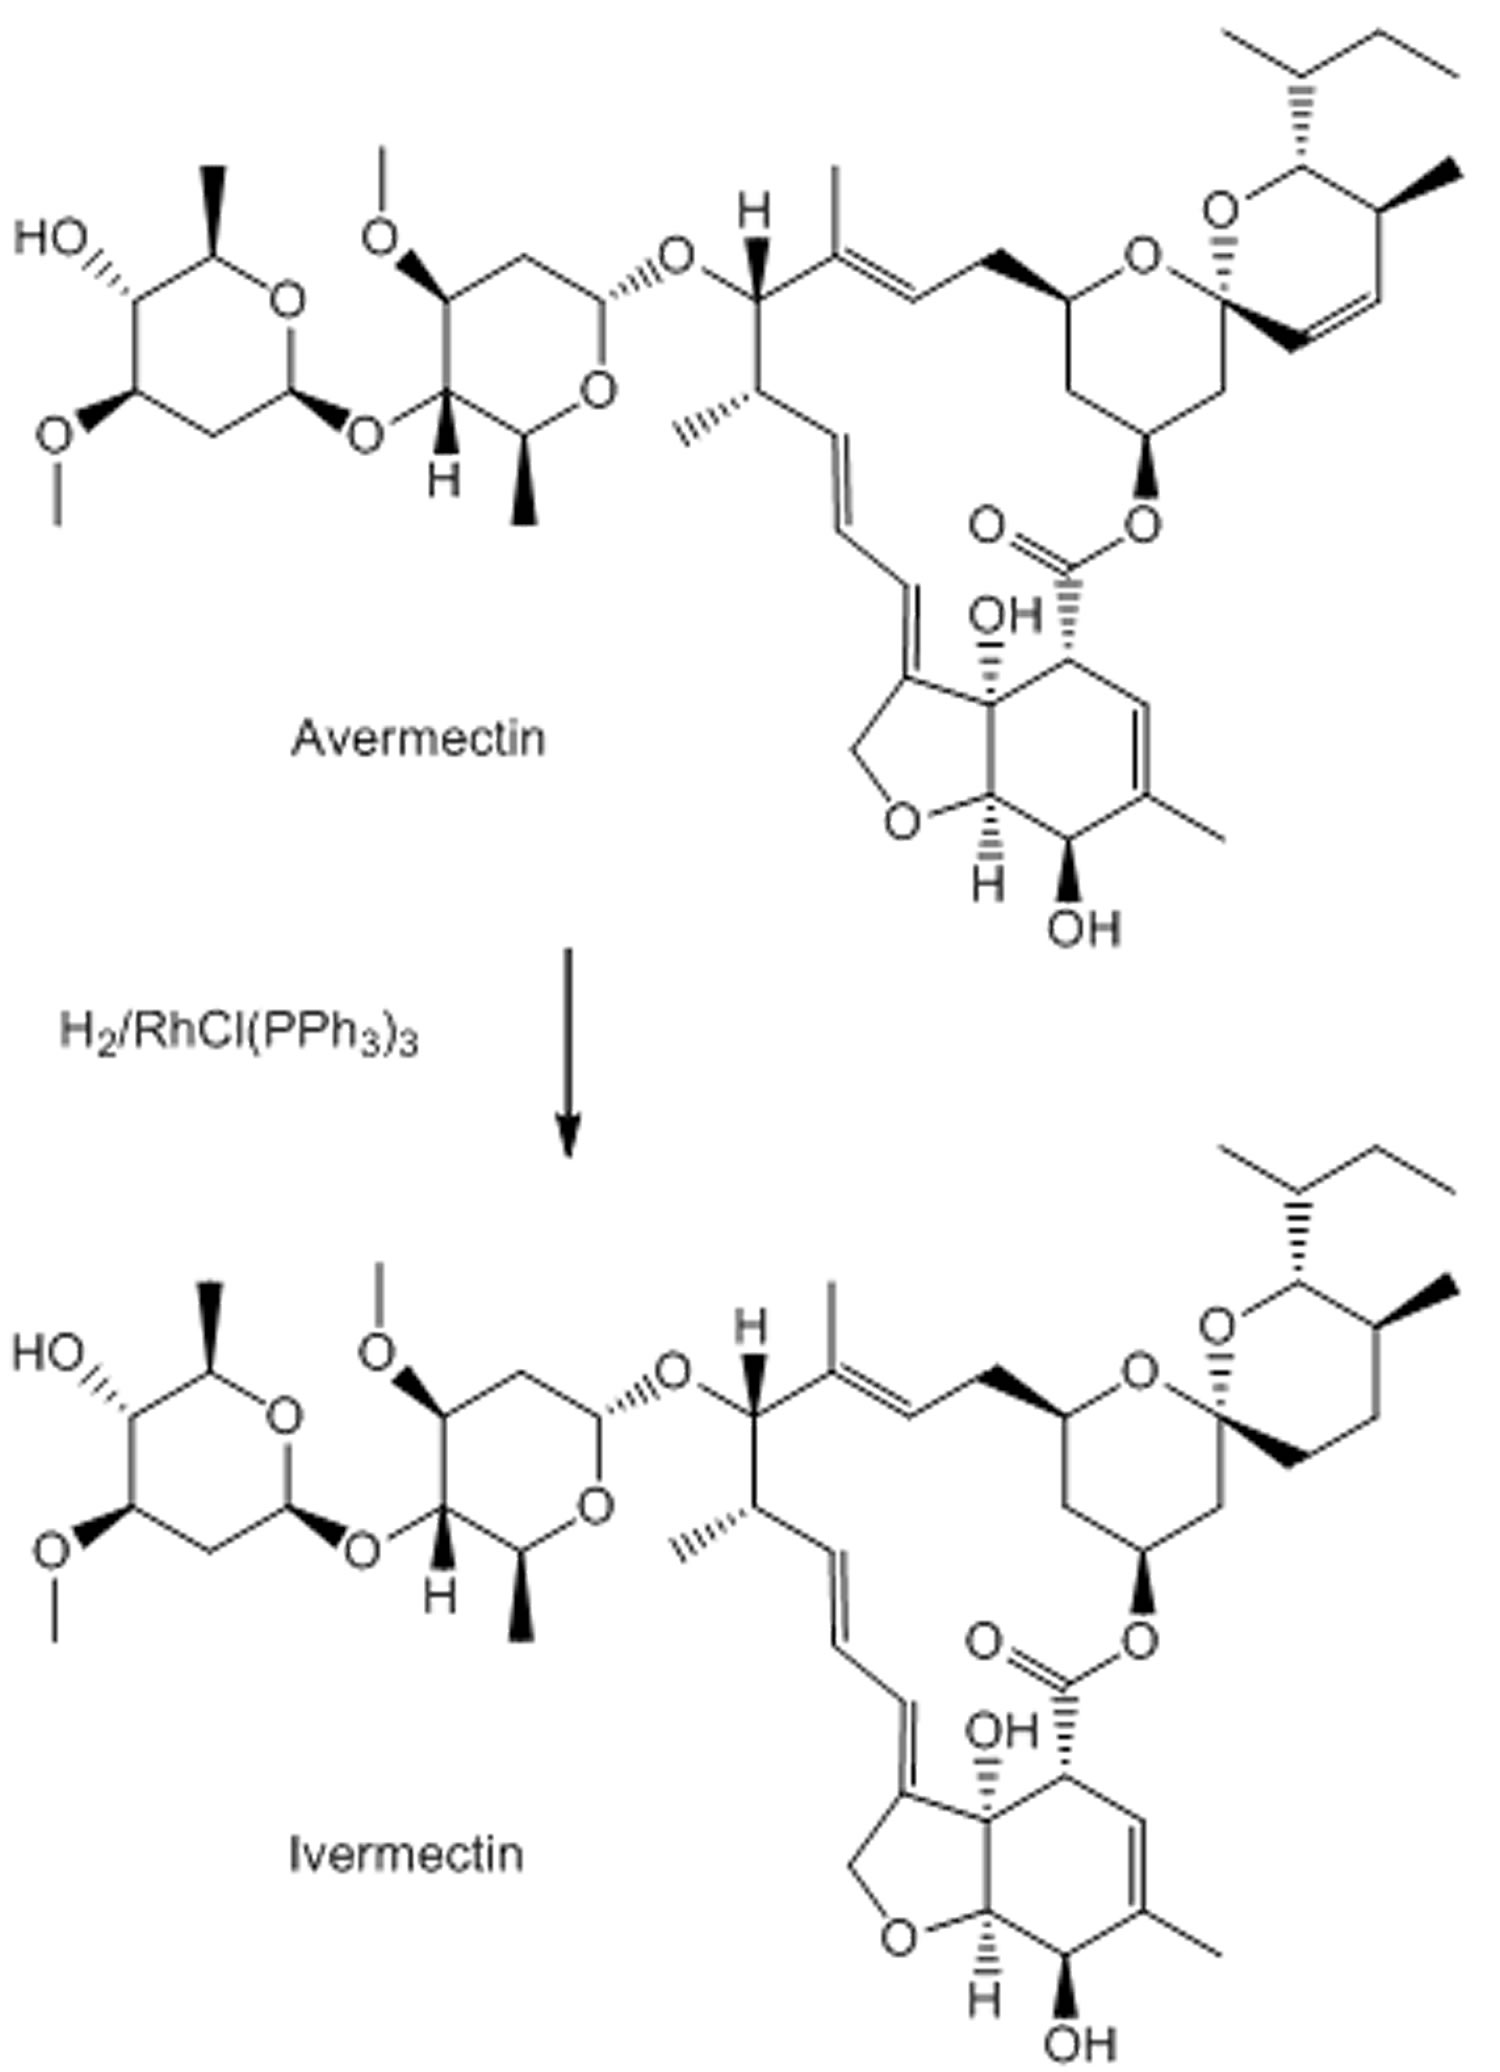 Ivermectin synthesis